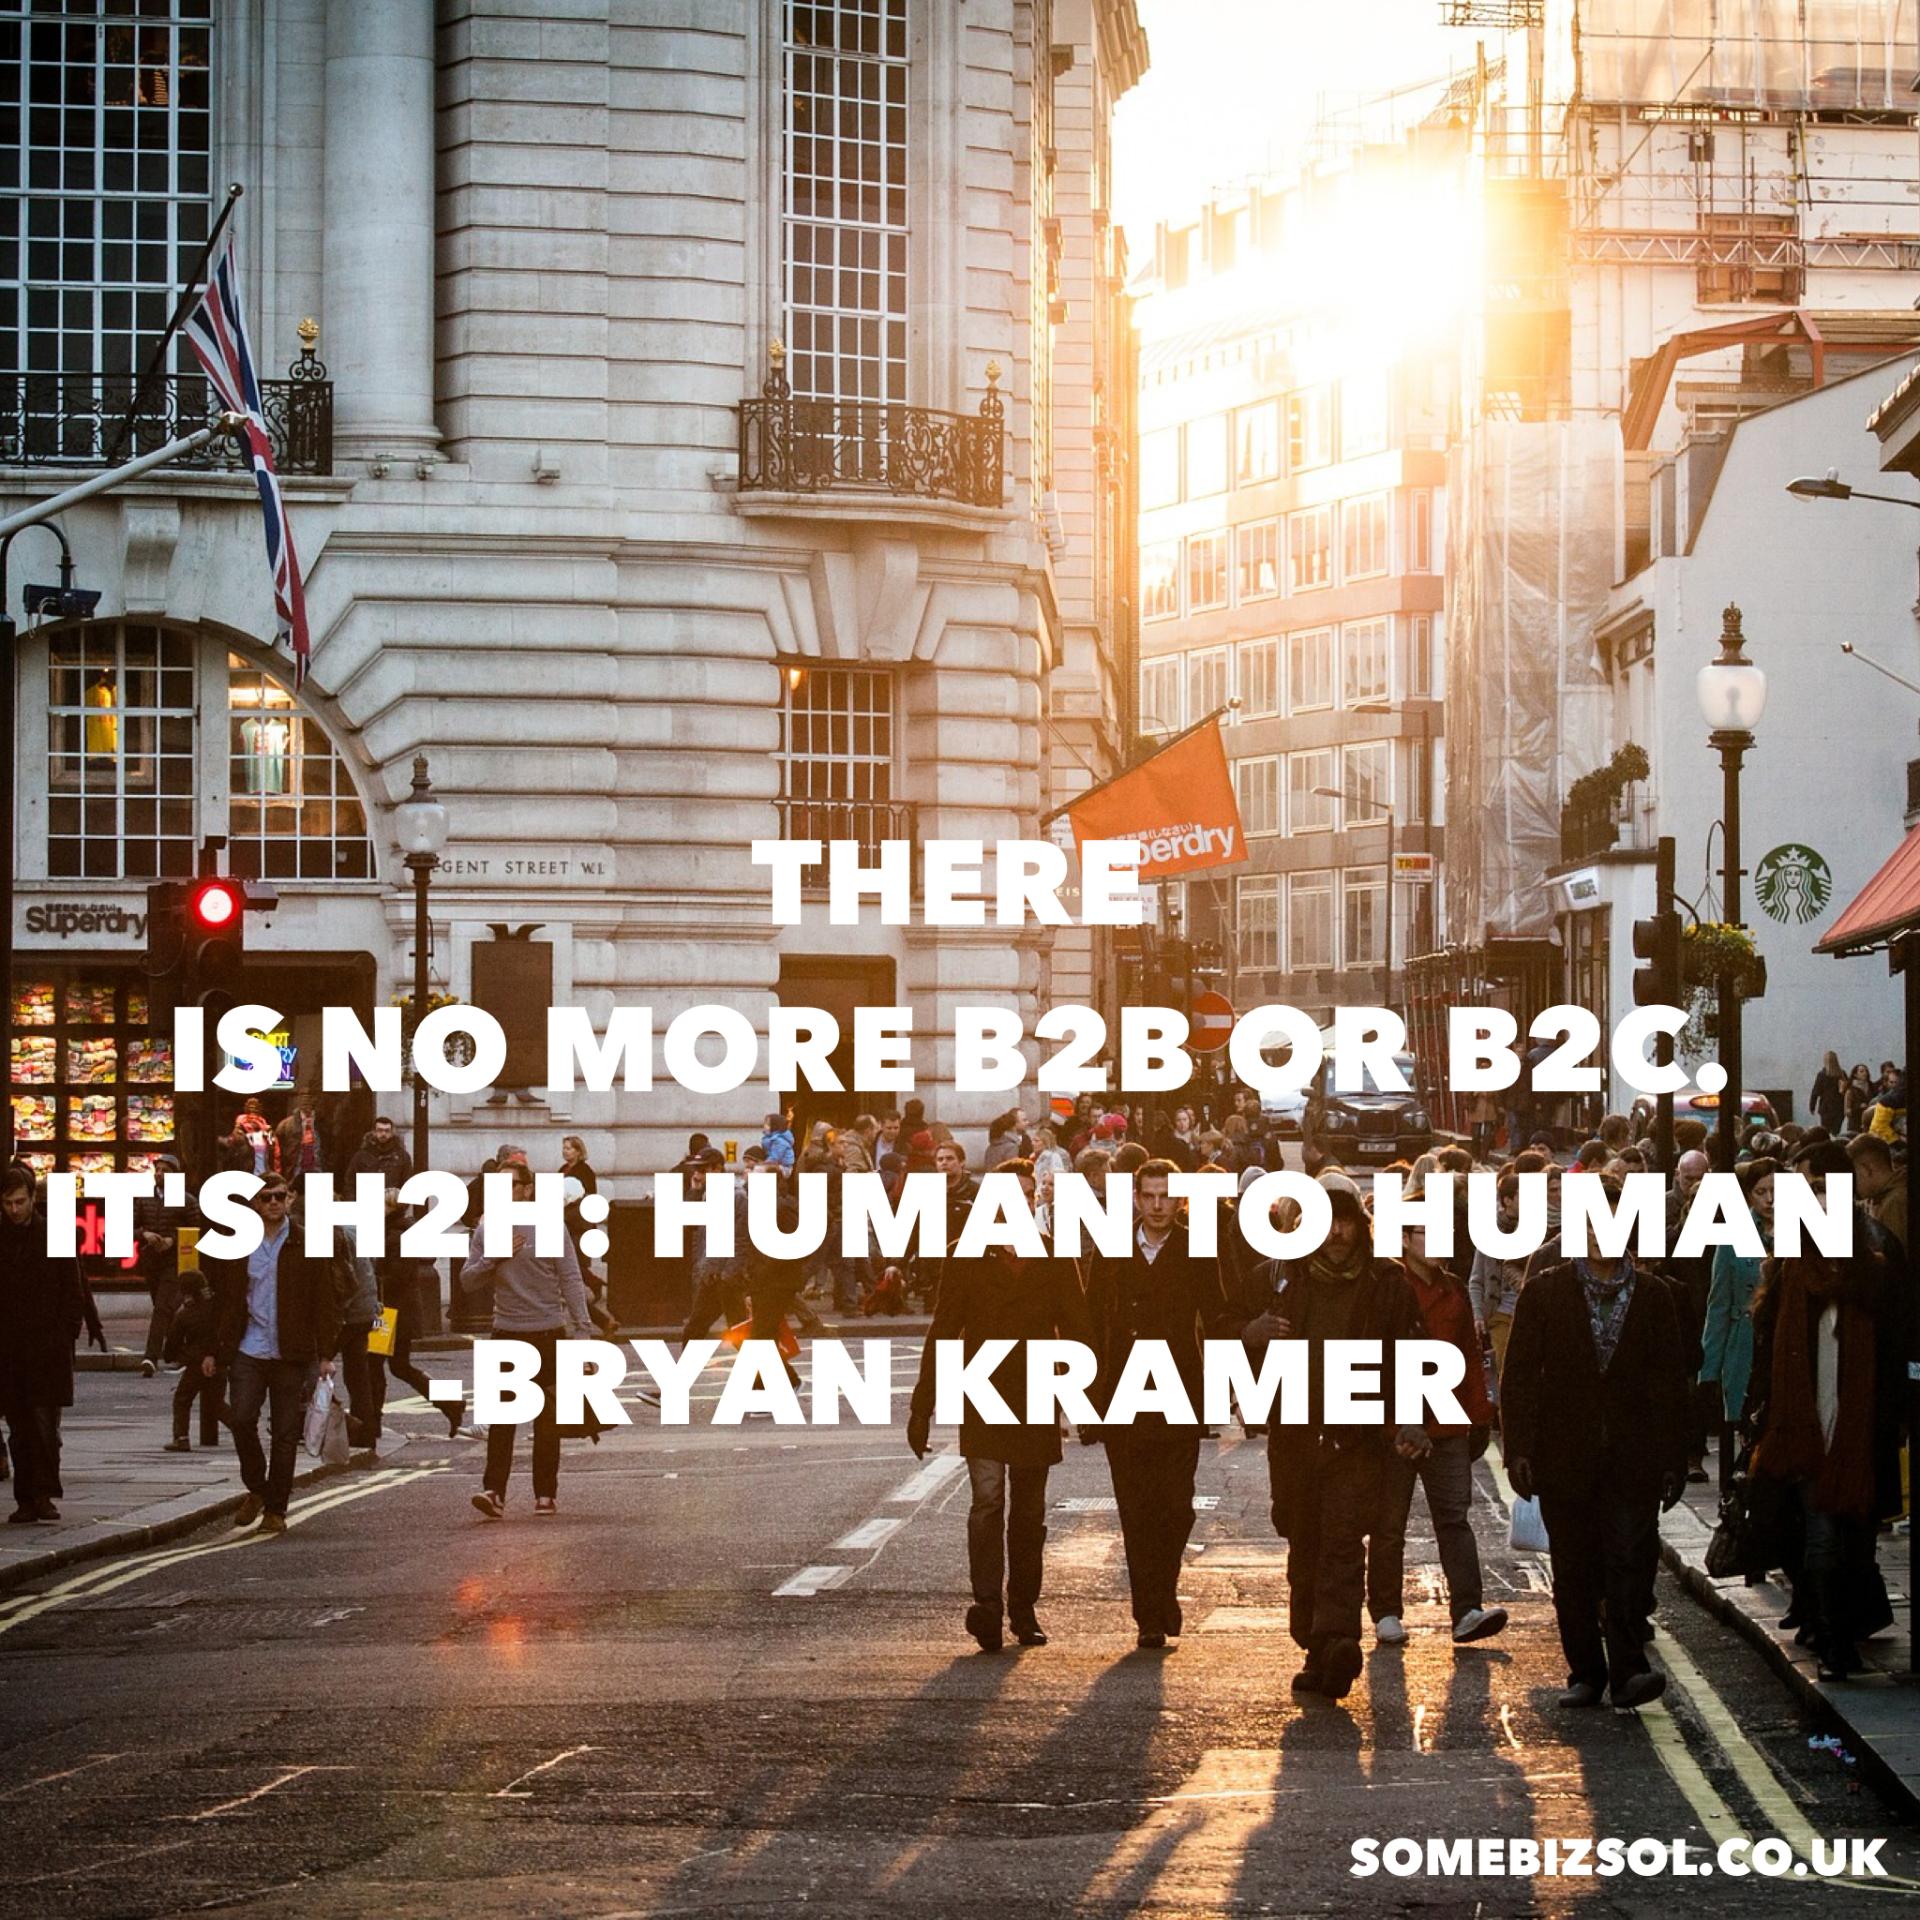 There is no more B2B or B2C. It's H2H: Human to Human